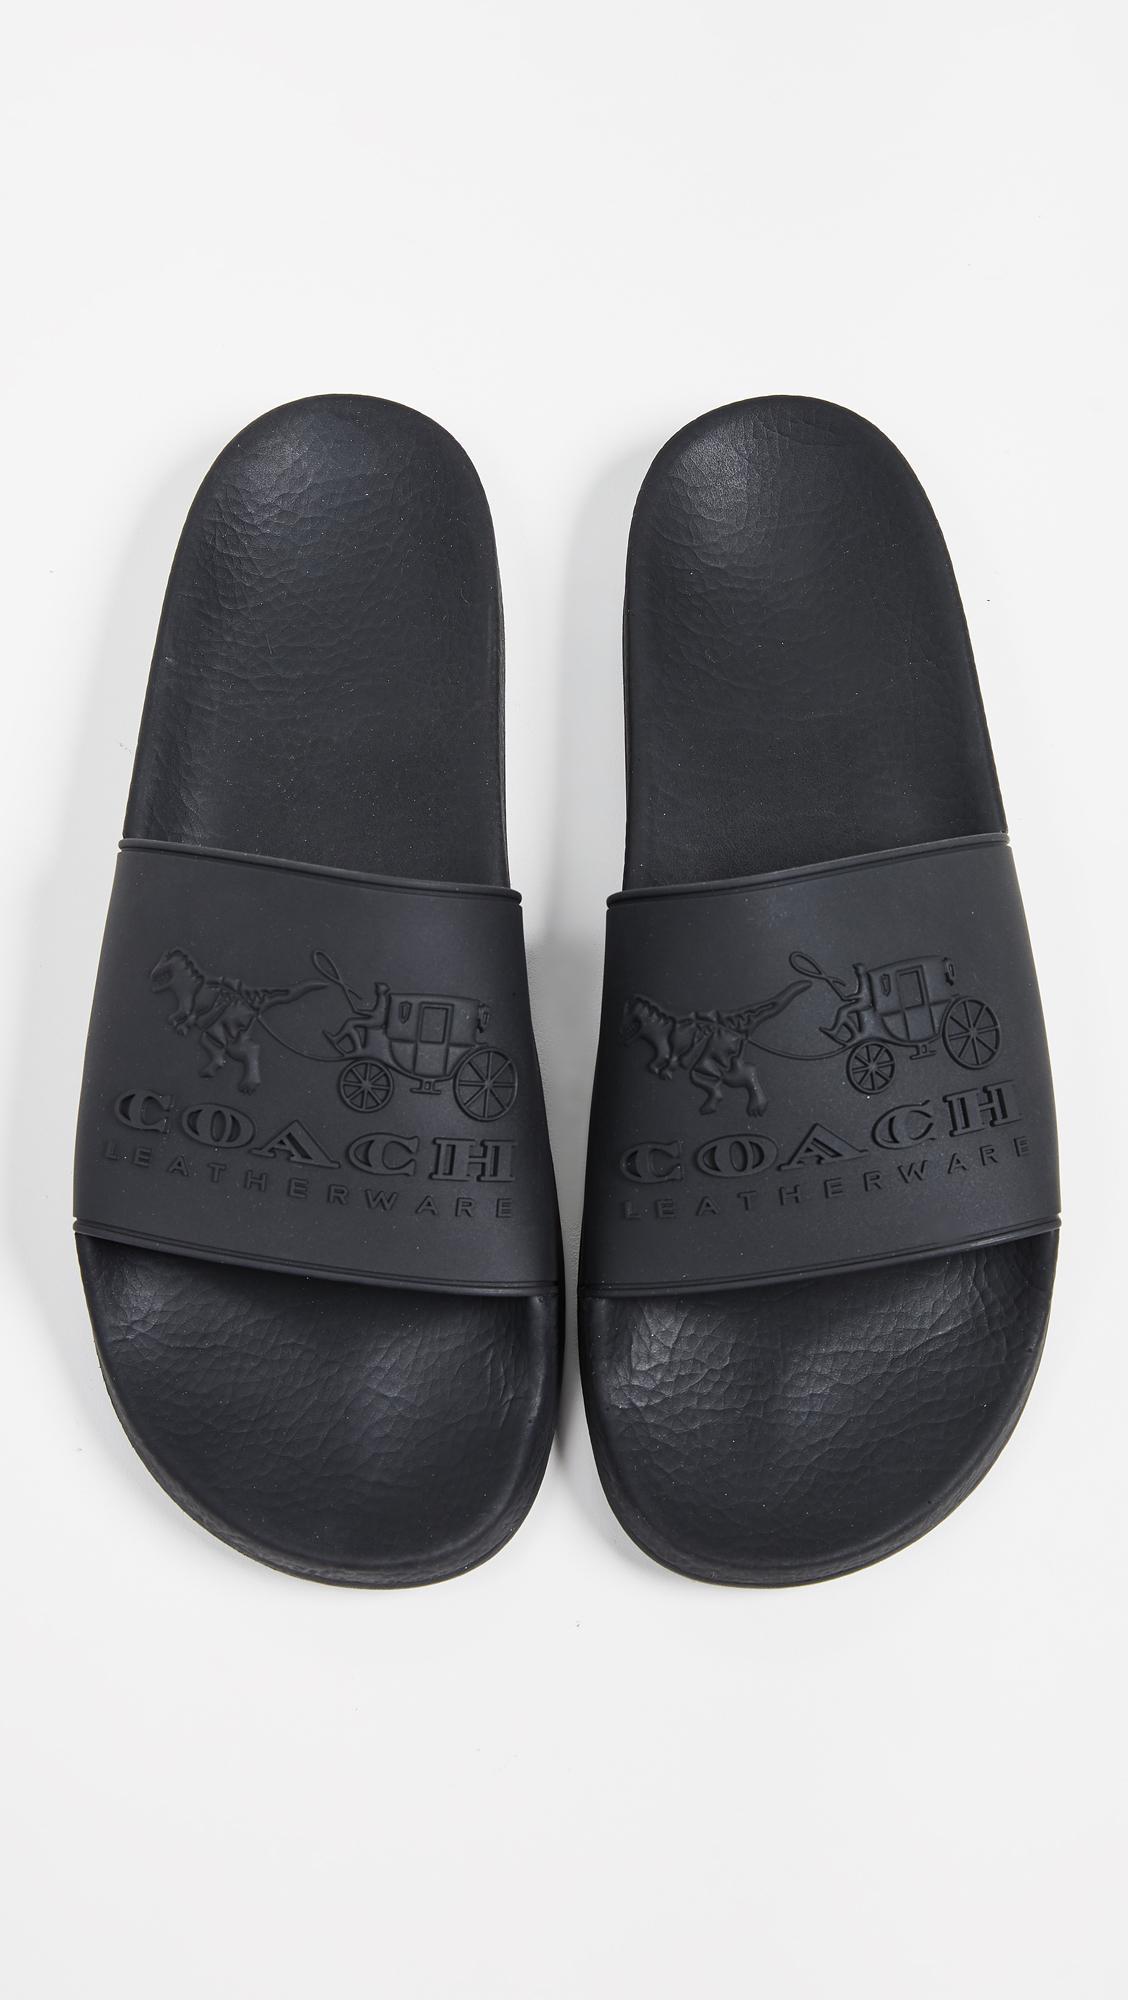 3b6b535914b COACH Coach 3d Logo Slide Sandals in Black for Men - Lyst